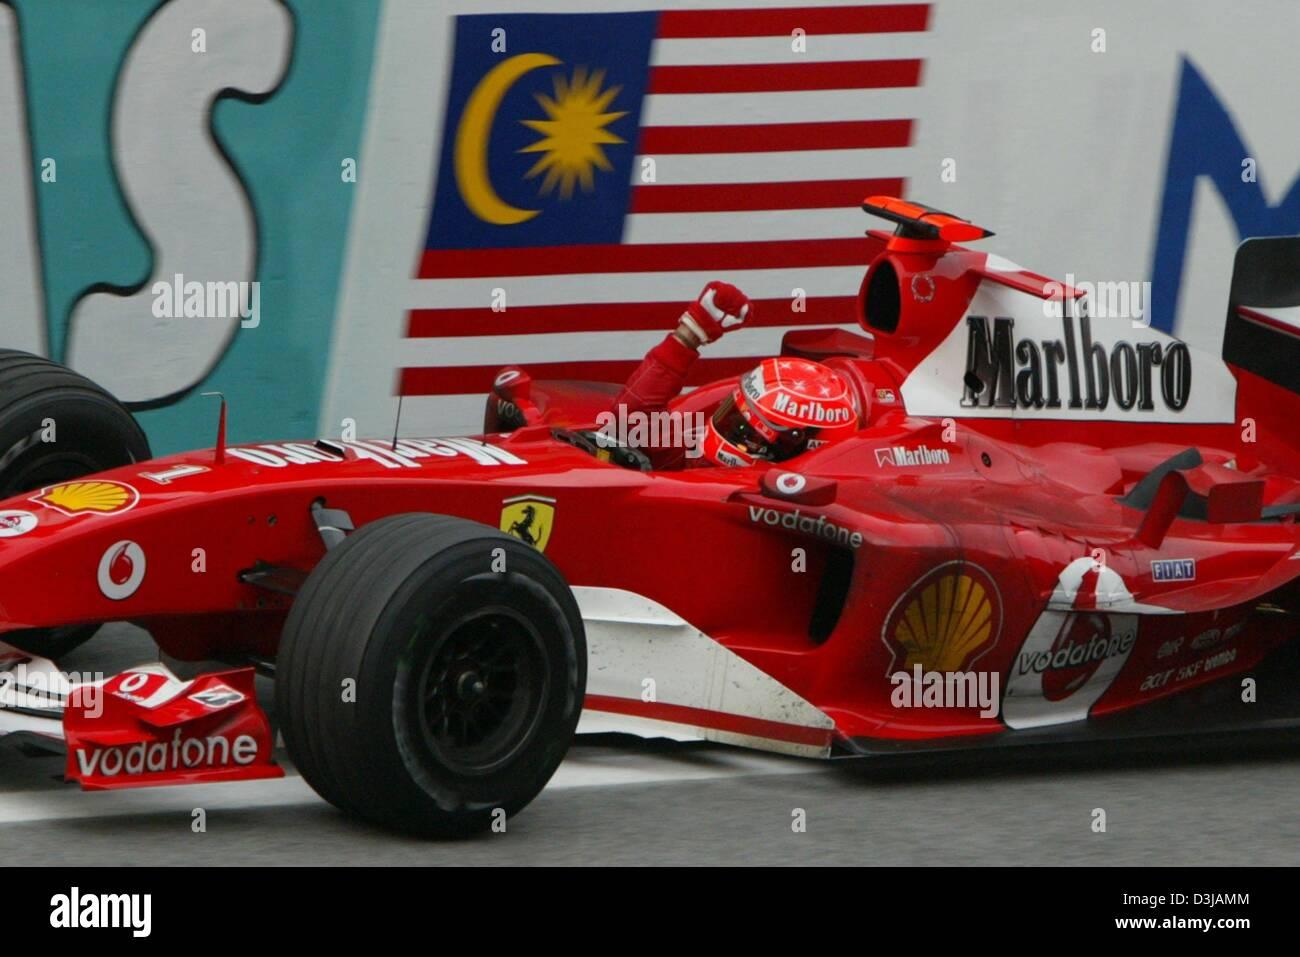 Dpa The German F1 World Champion Michael Schumacher Ferrari Stock Photo Alamy